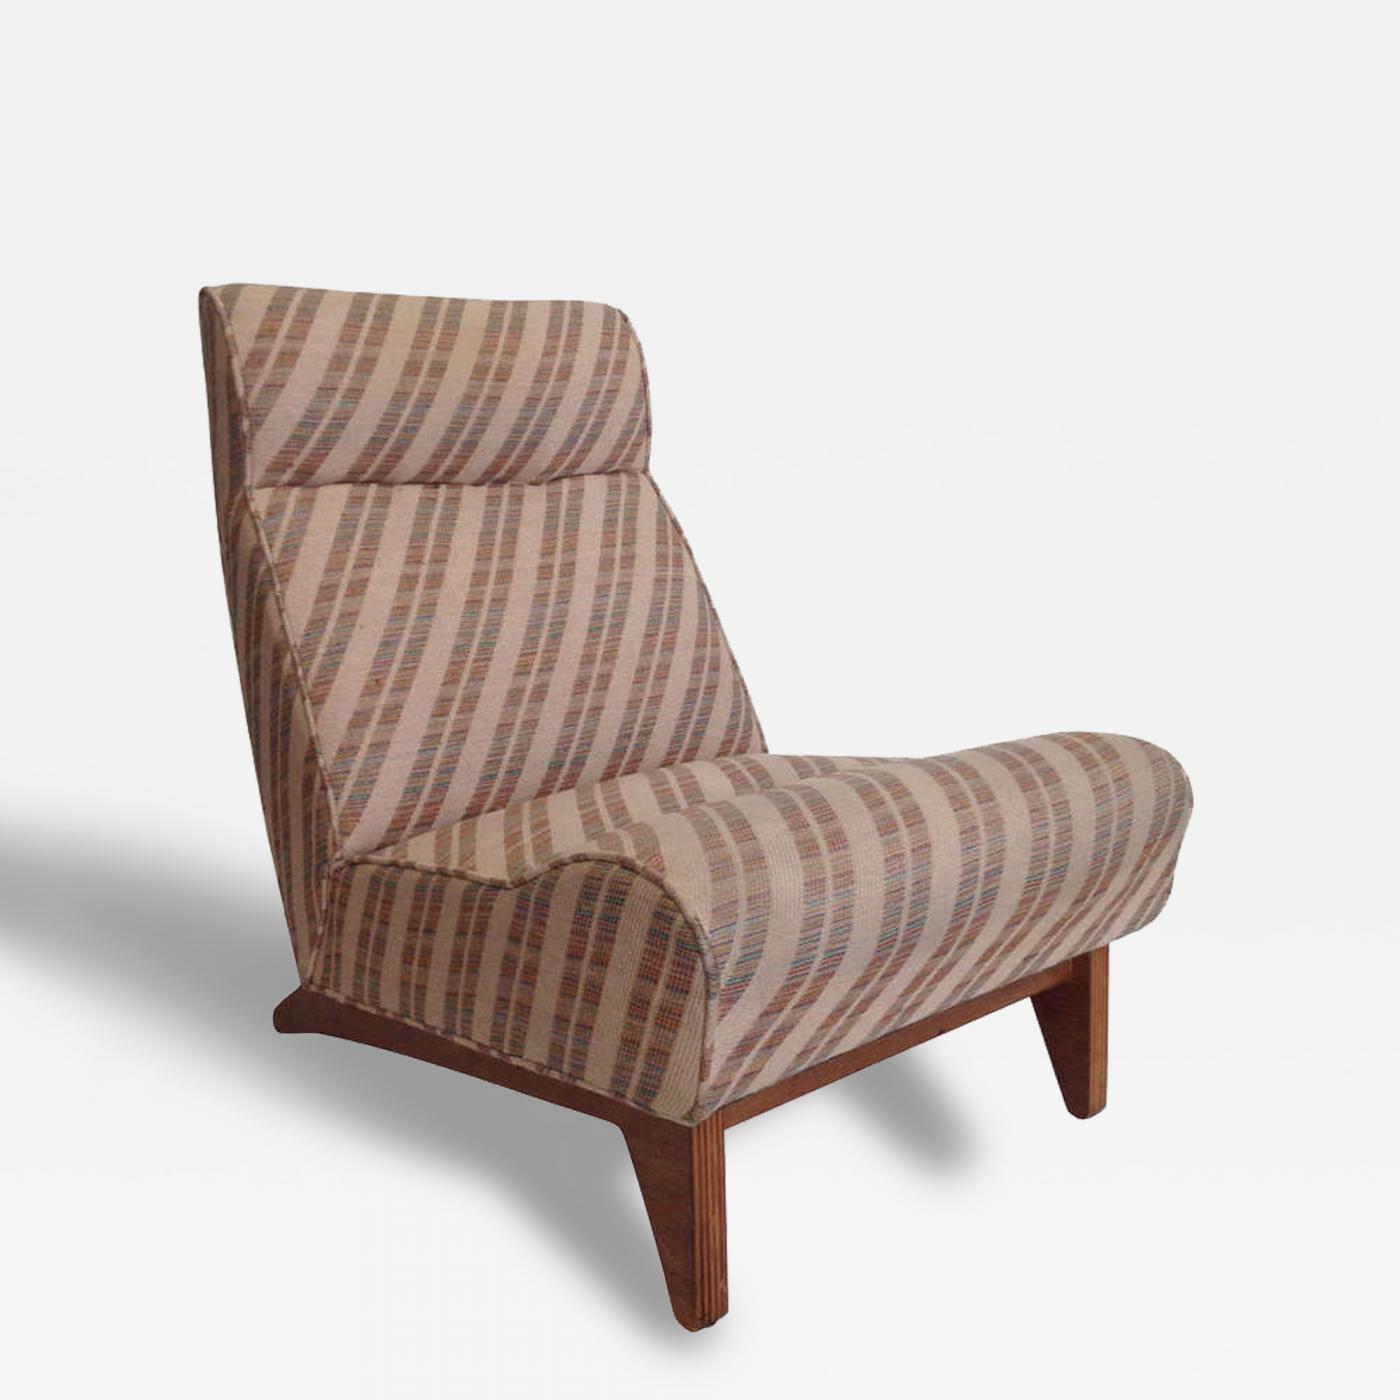 Edward wormley rare edward wormley original chair - Edward wormley chairs ...